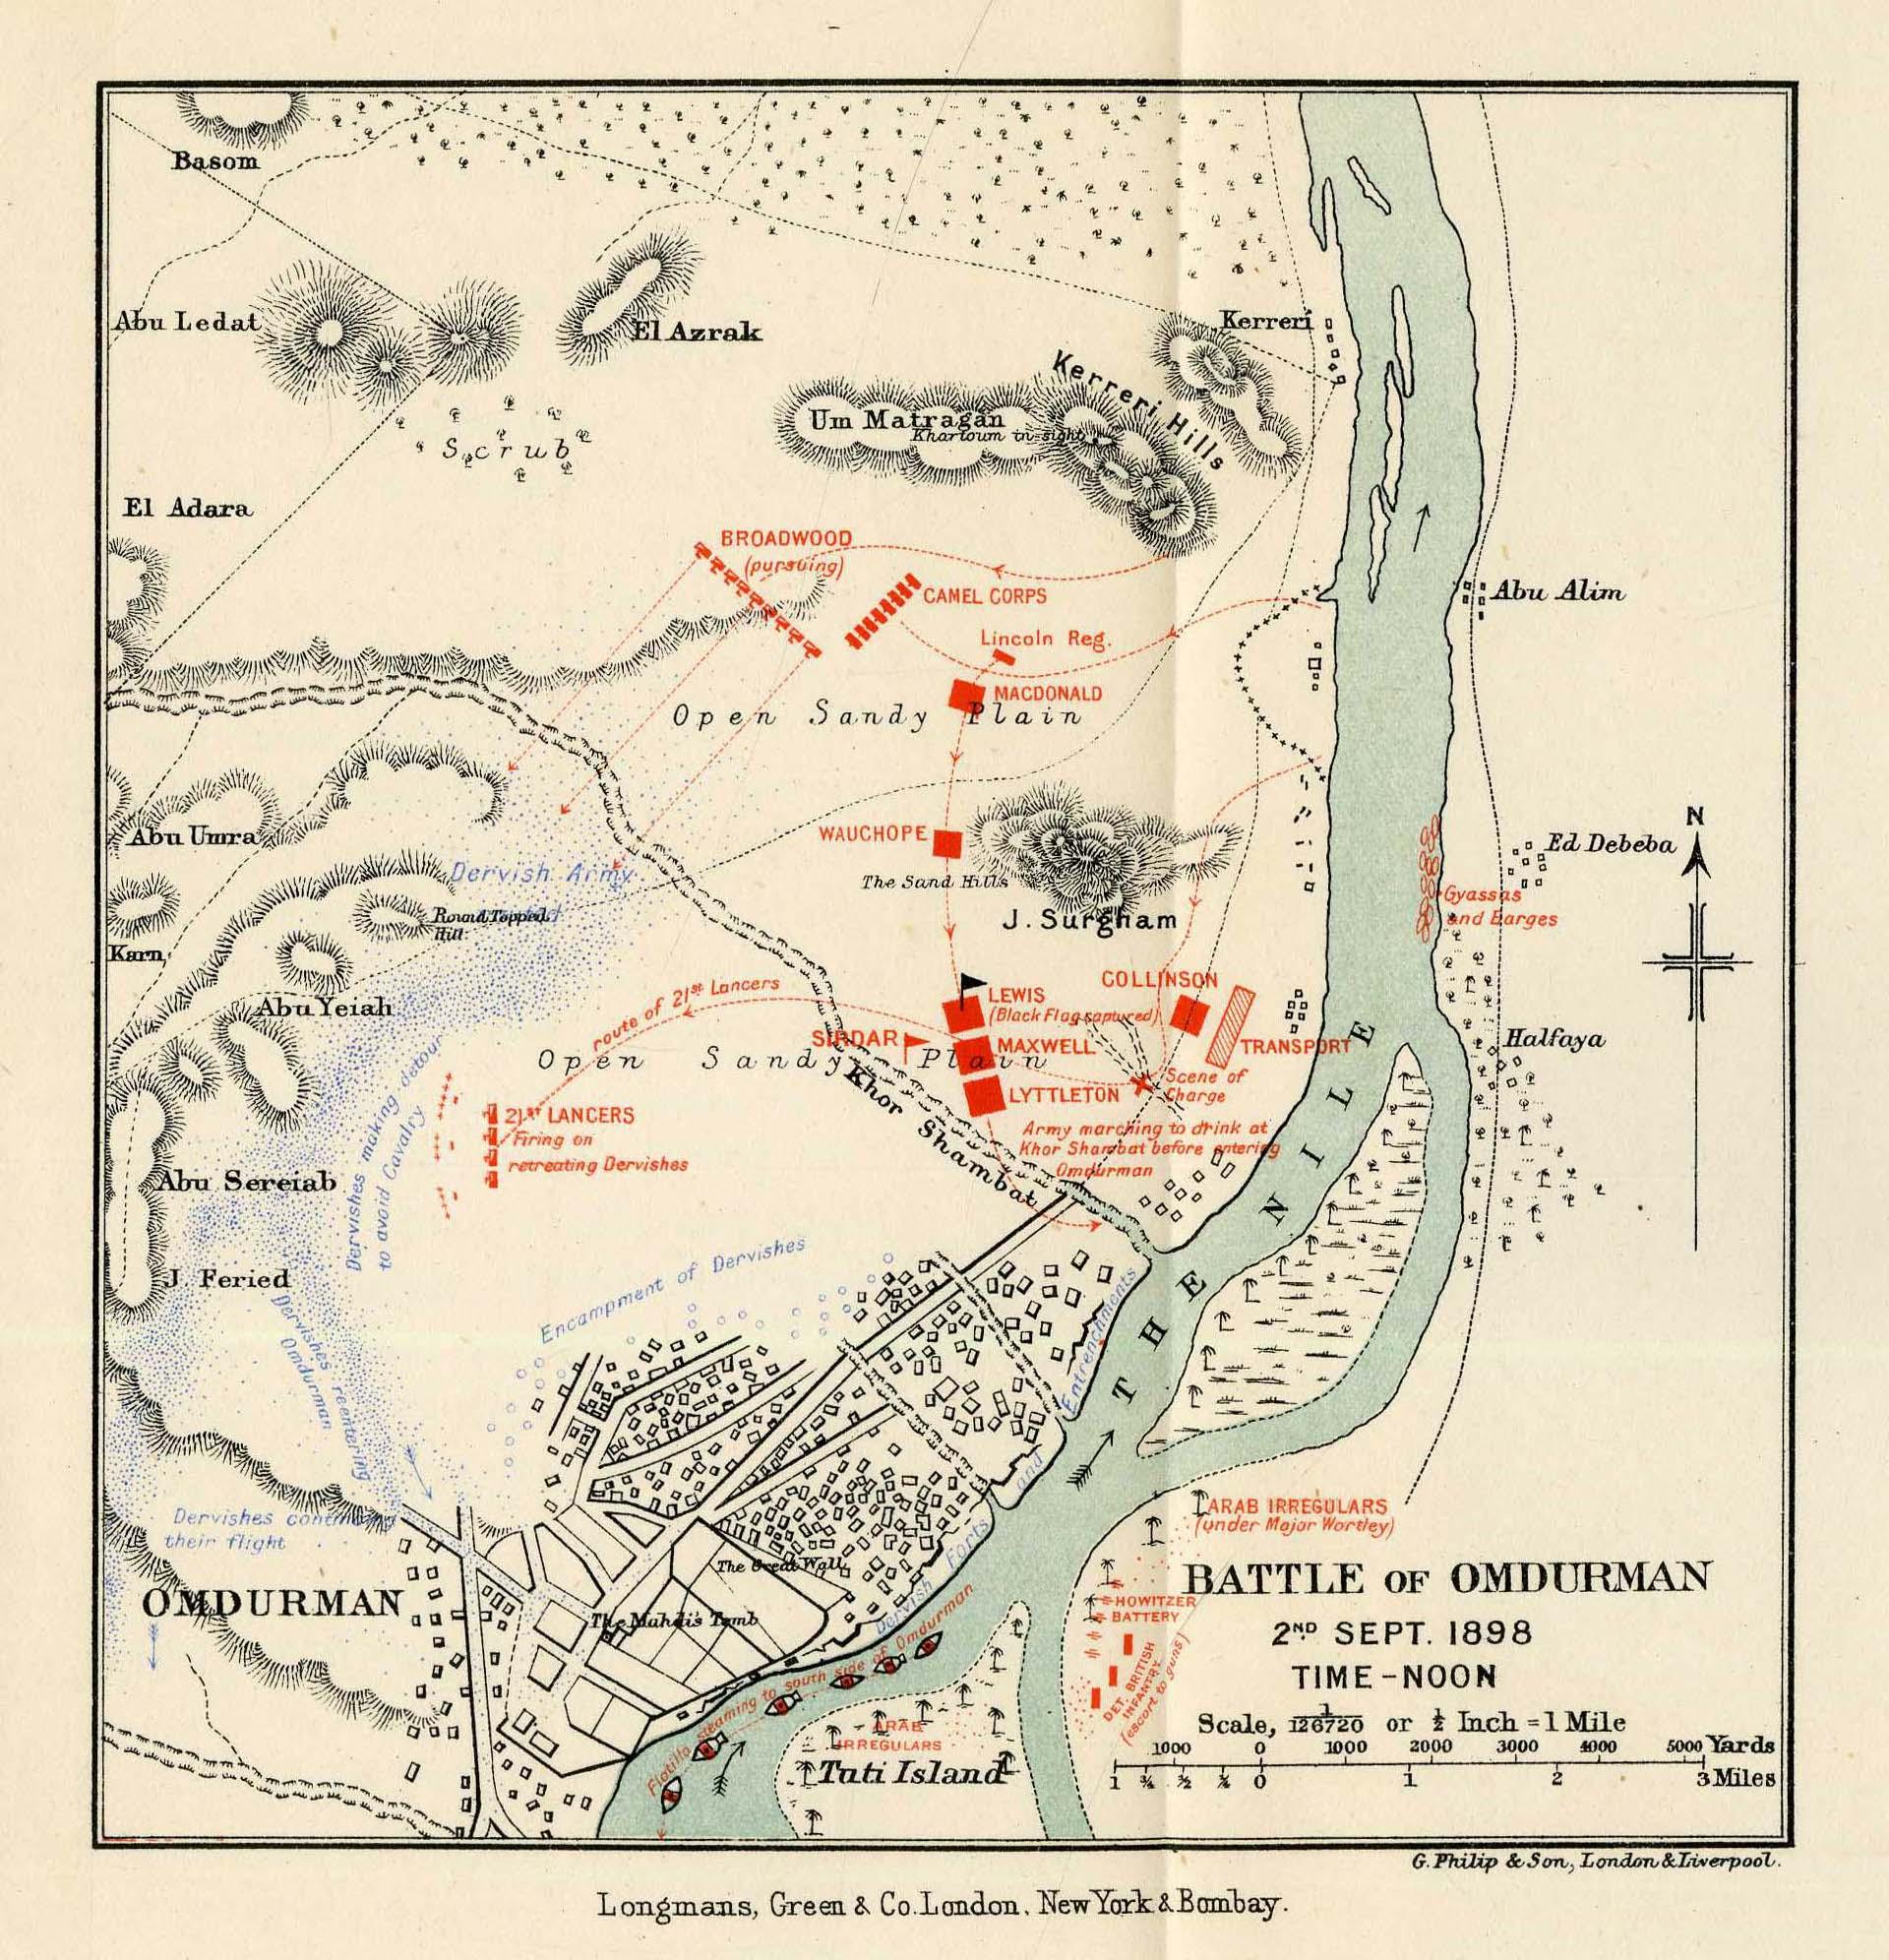 River_War_2-9_Omdurman_Battle_Noon